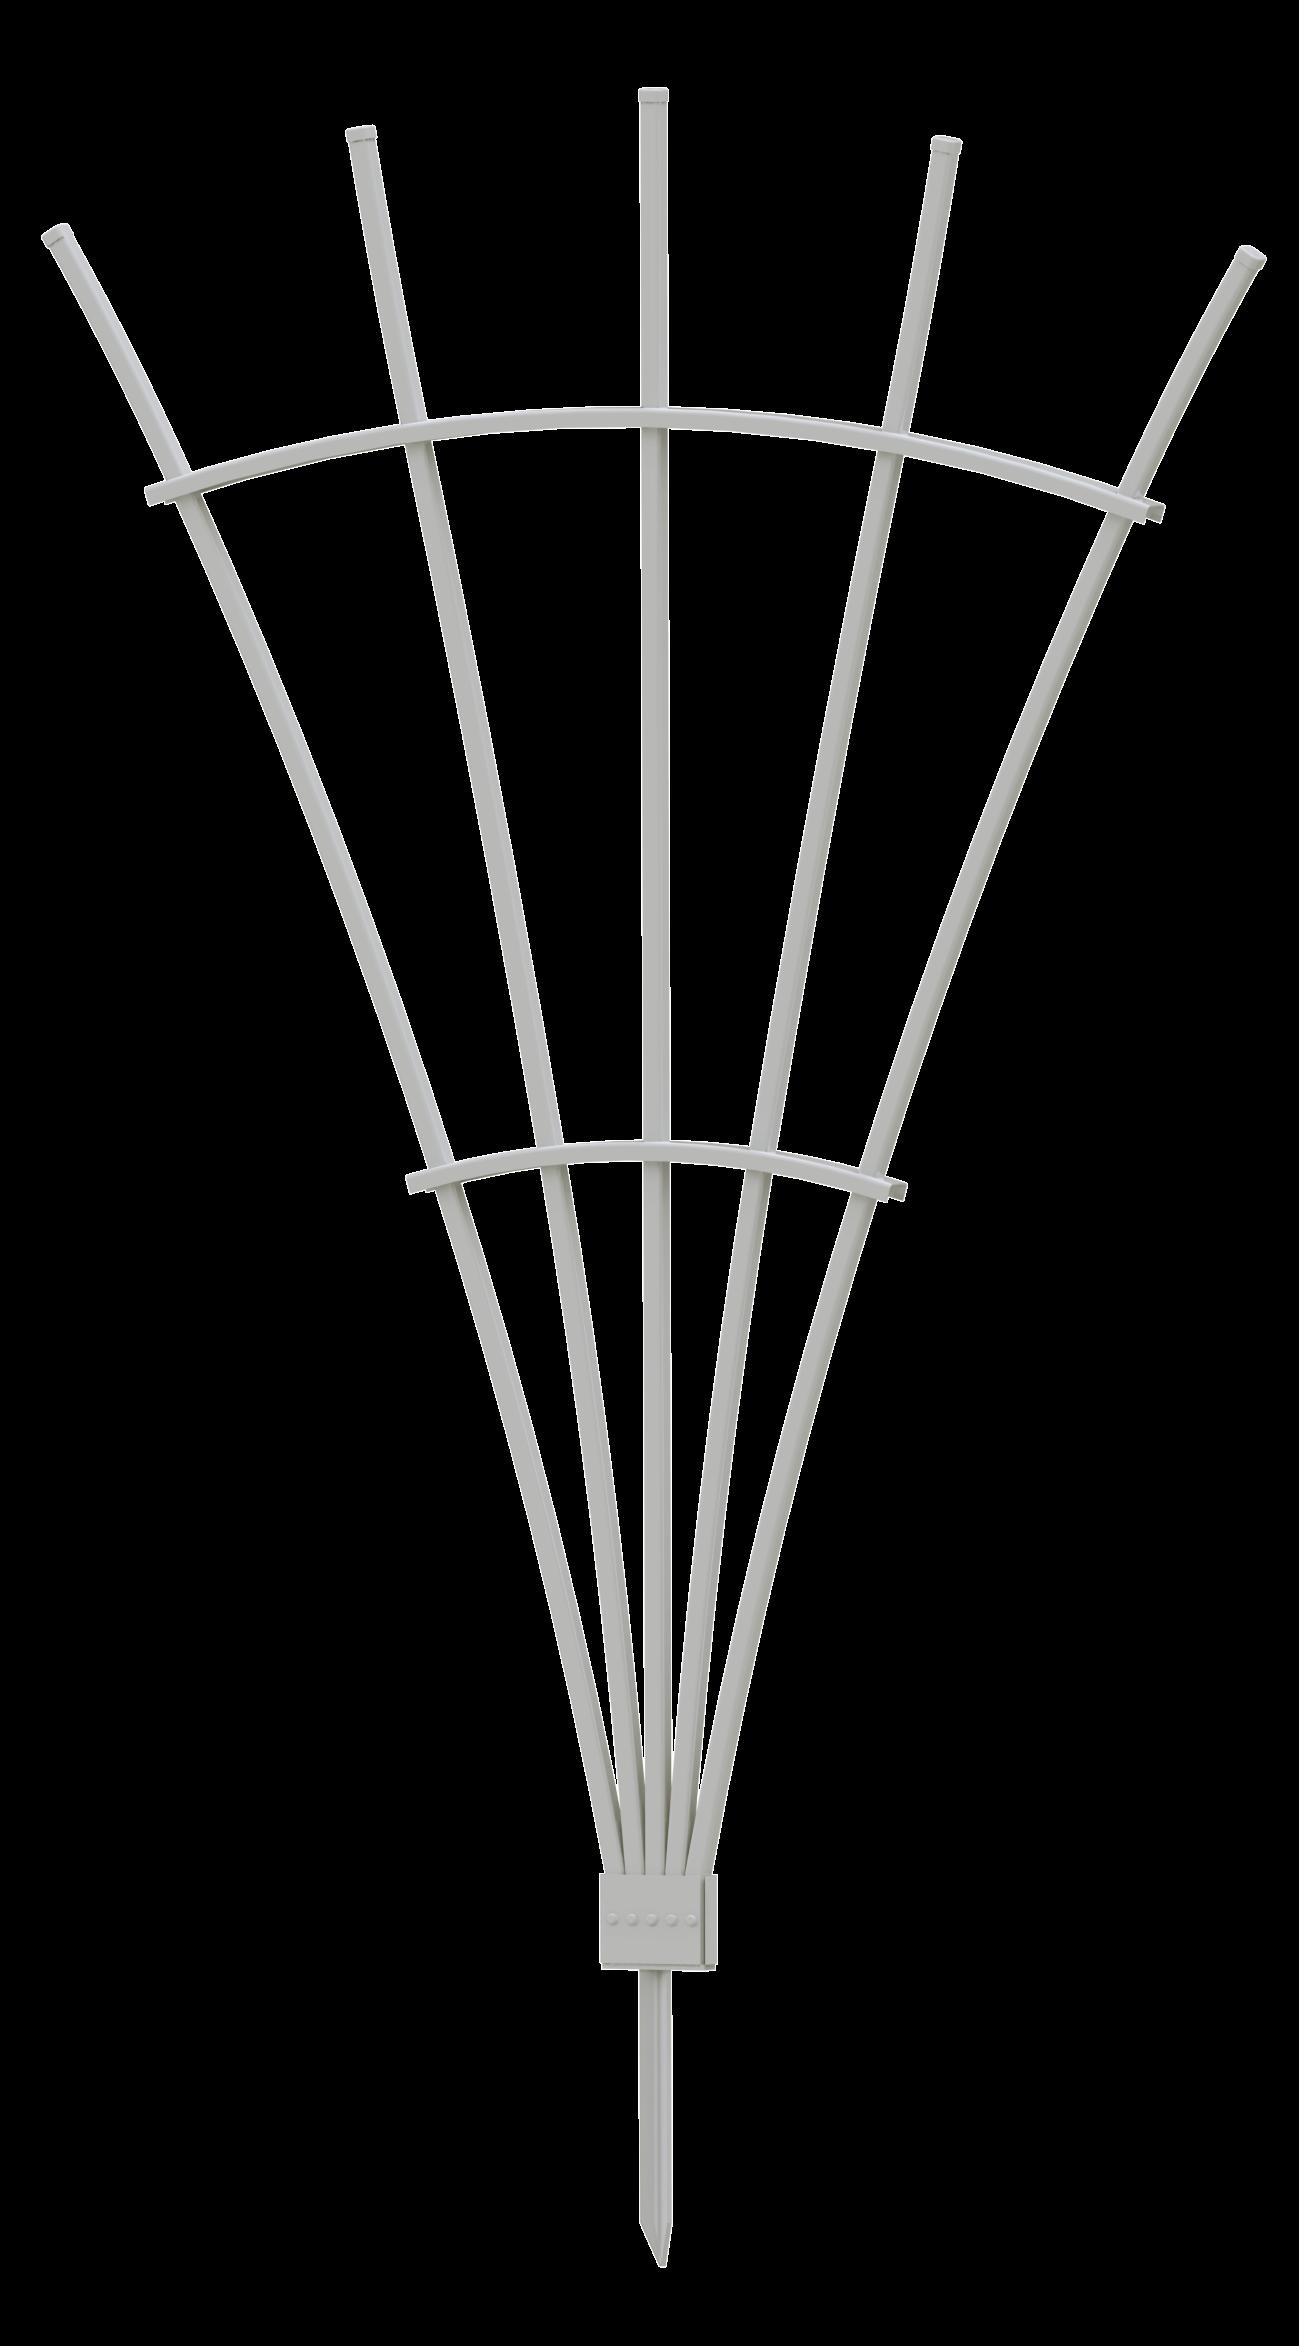 Vinyl Garden Trellises - Superior Plastic Products